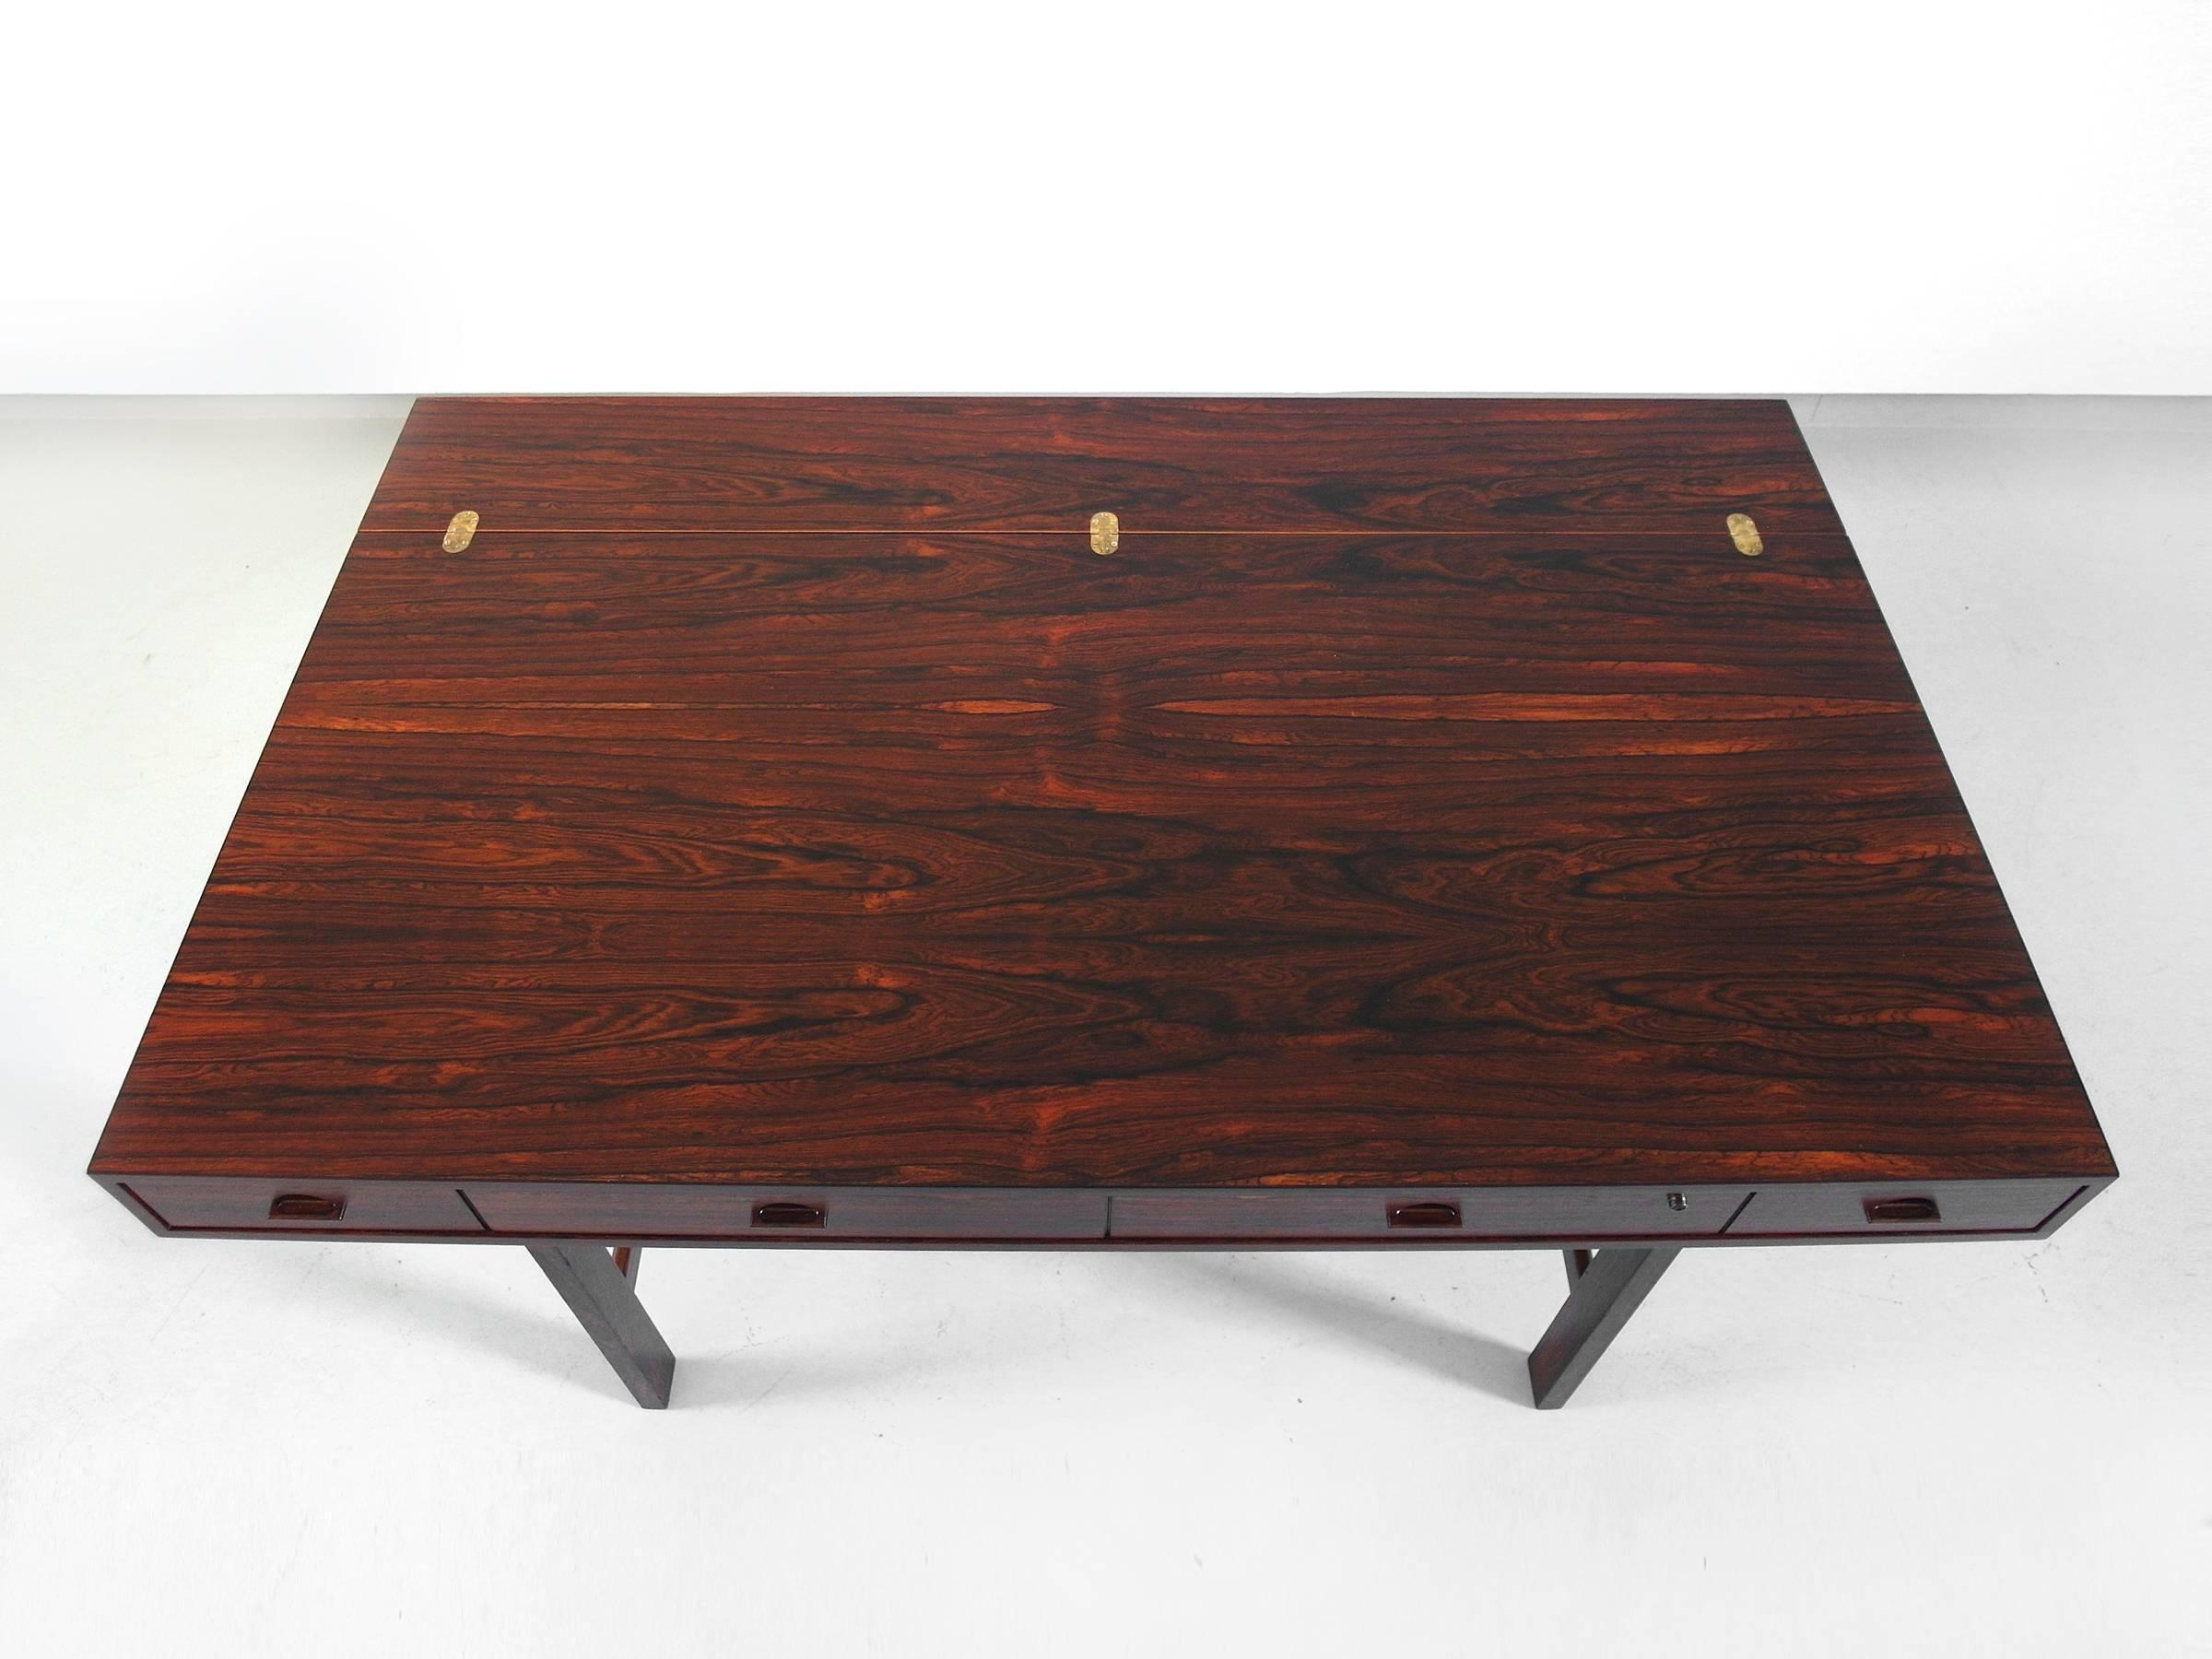 Peter Løvig Nielsen Jens Quistgaard Flip Top Desk In Rosewood Denmark 1966 At 1stdibs